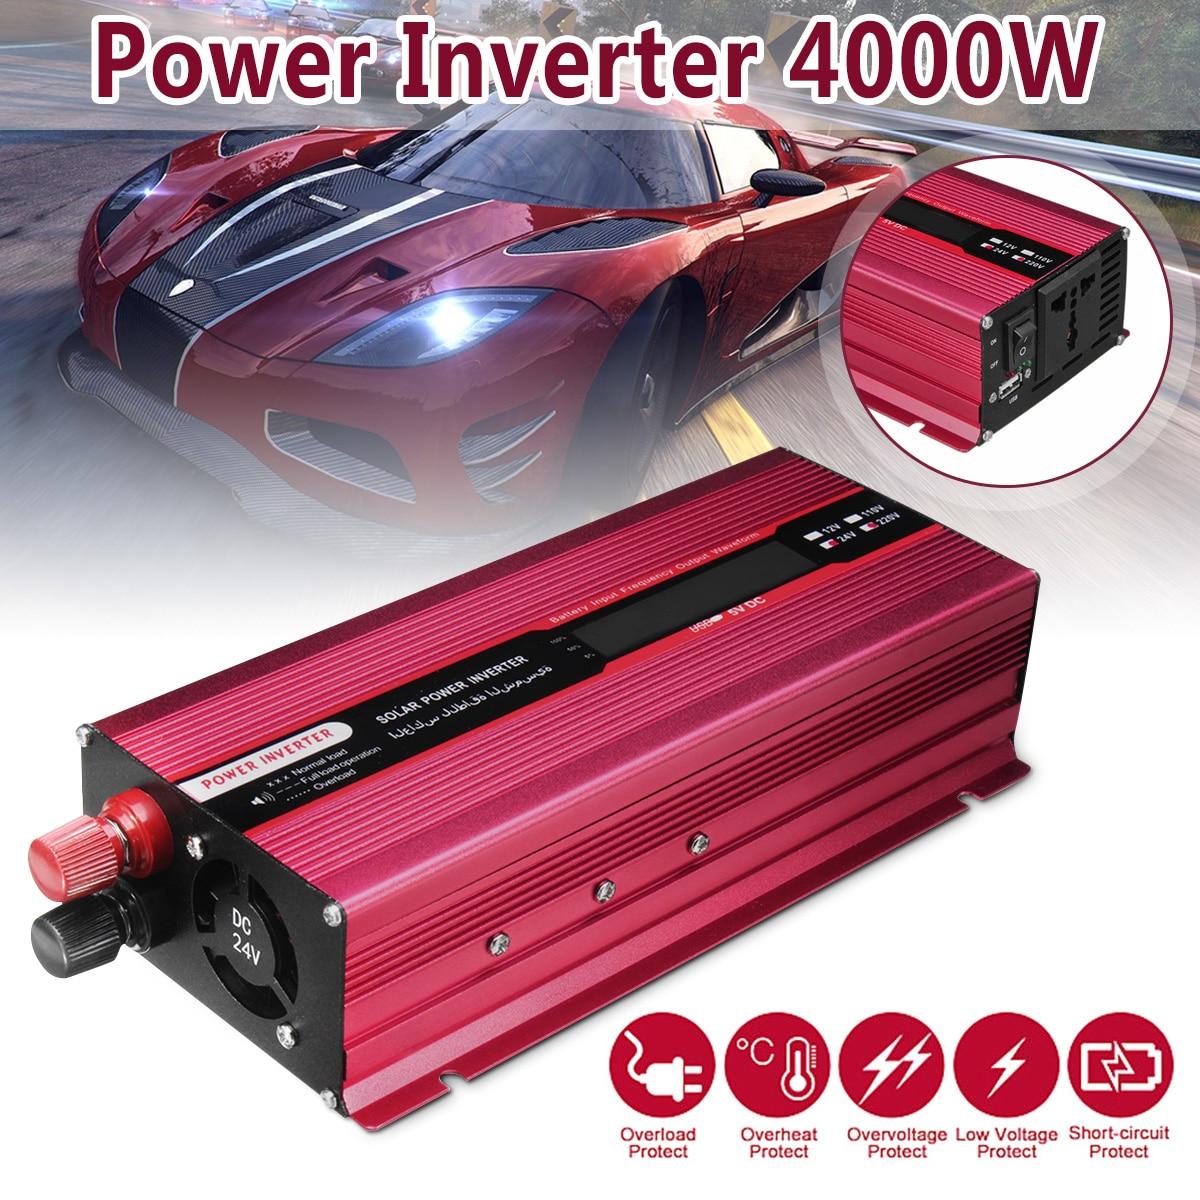 4000W Car Solar Power Inverter 12/24V To AC 220/110V USB Modified Sine Wave Converter Efficiency Aluminum Alloy Universal Socket4000W Car Solar Power Inverter 12/24V To AC 220/110V USB Modified Sine Wave Converter Efficiency Aluminum Alloy Universal Socket